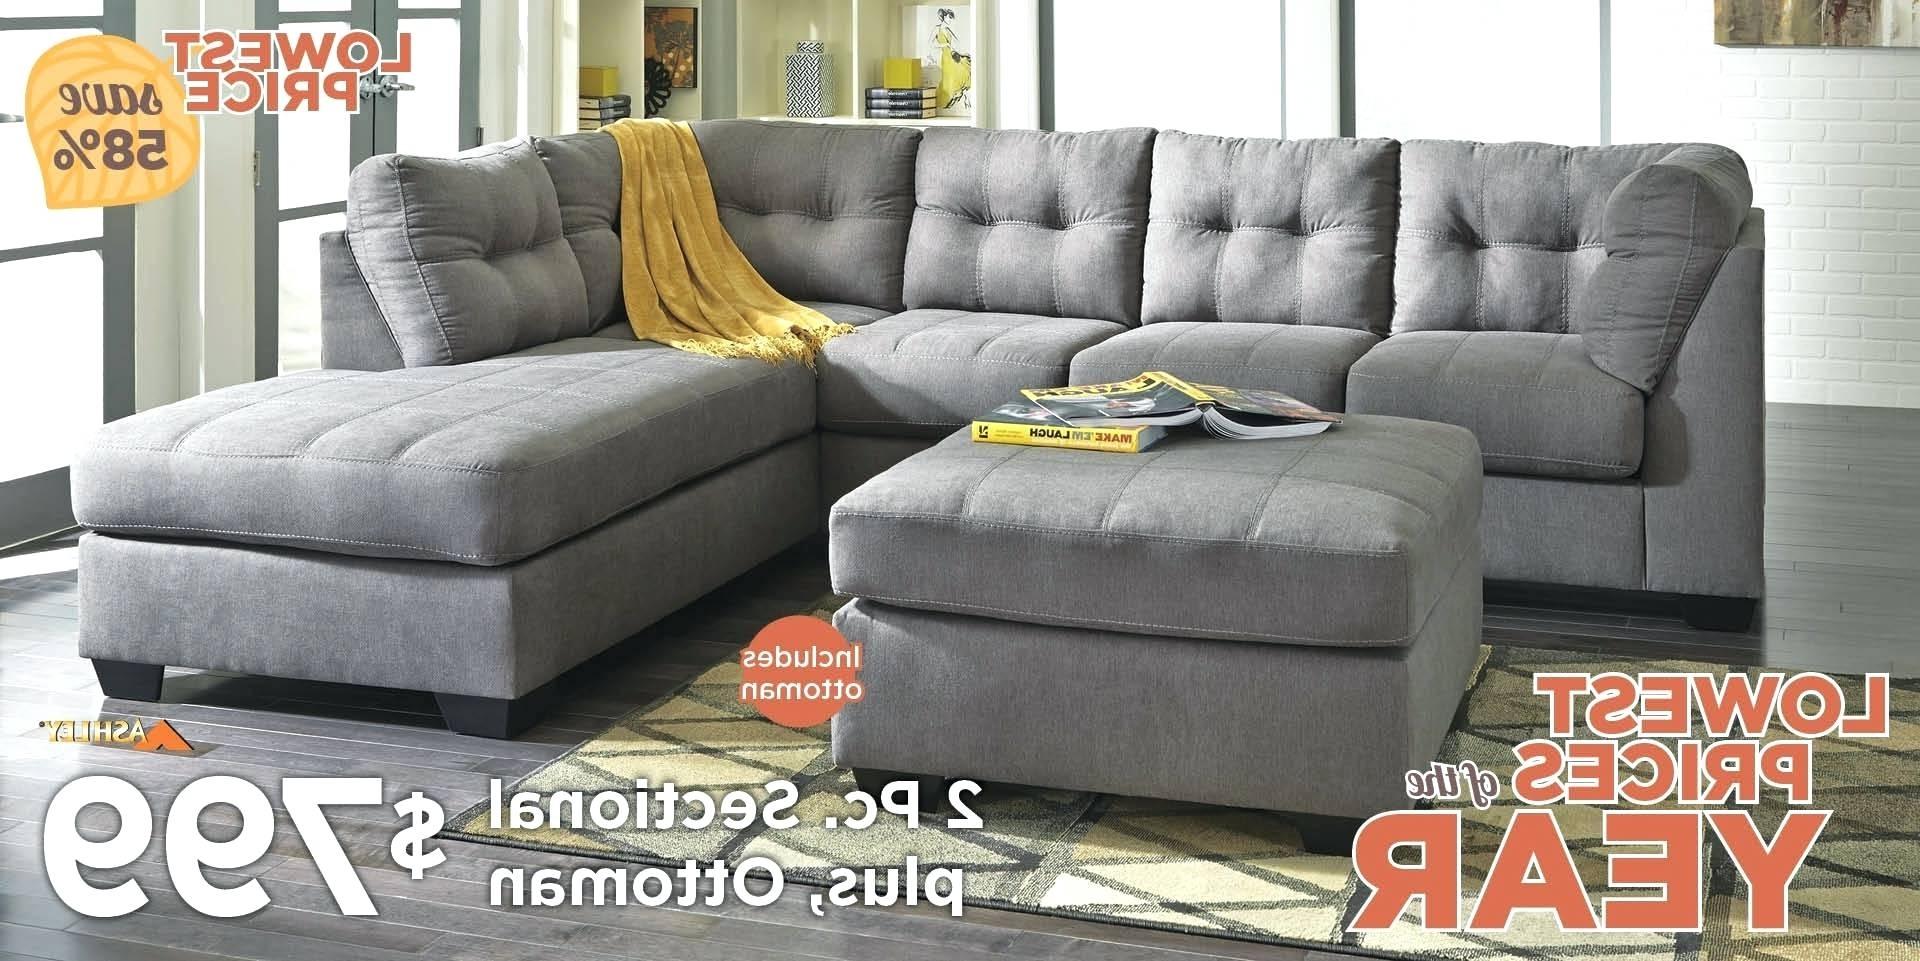 Current Sam Levitz Furniture Tucson Az Two Piece Sectional With Full With Sam Levitz Sectional Sofas (View 2 of 20)